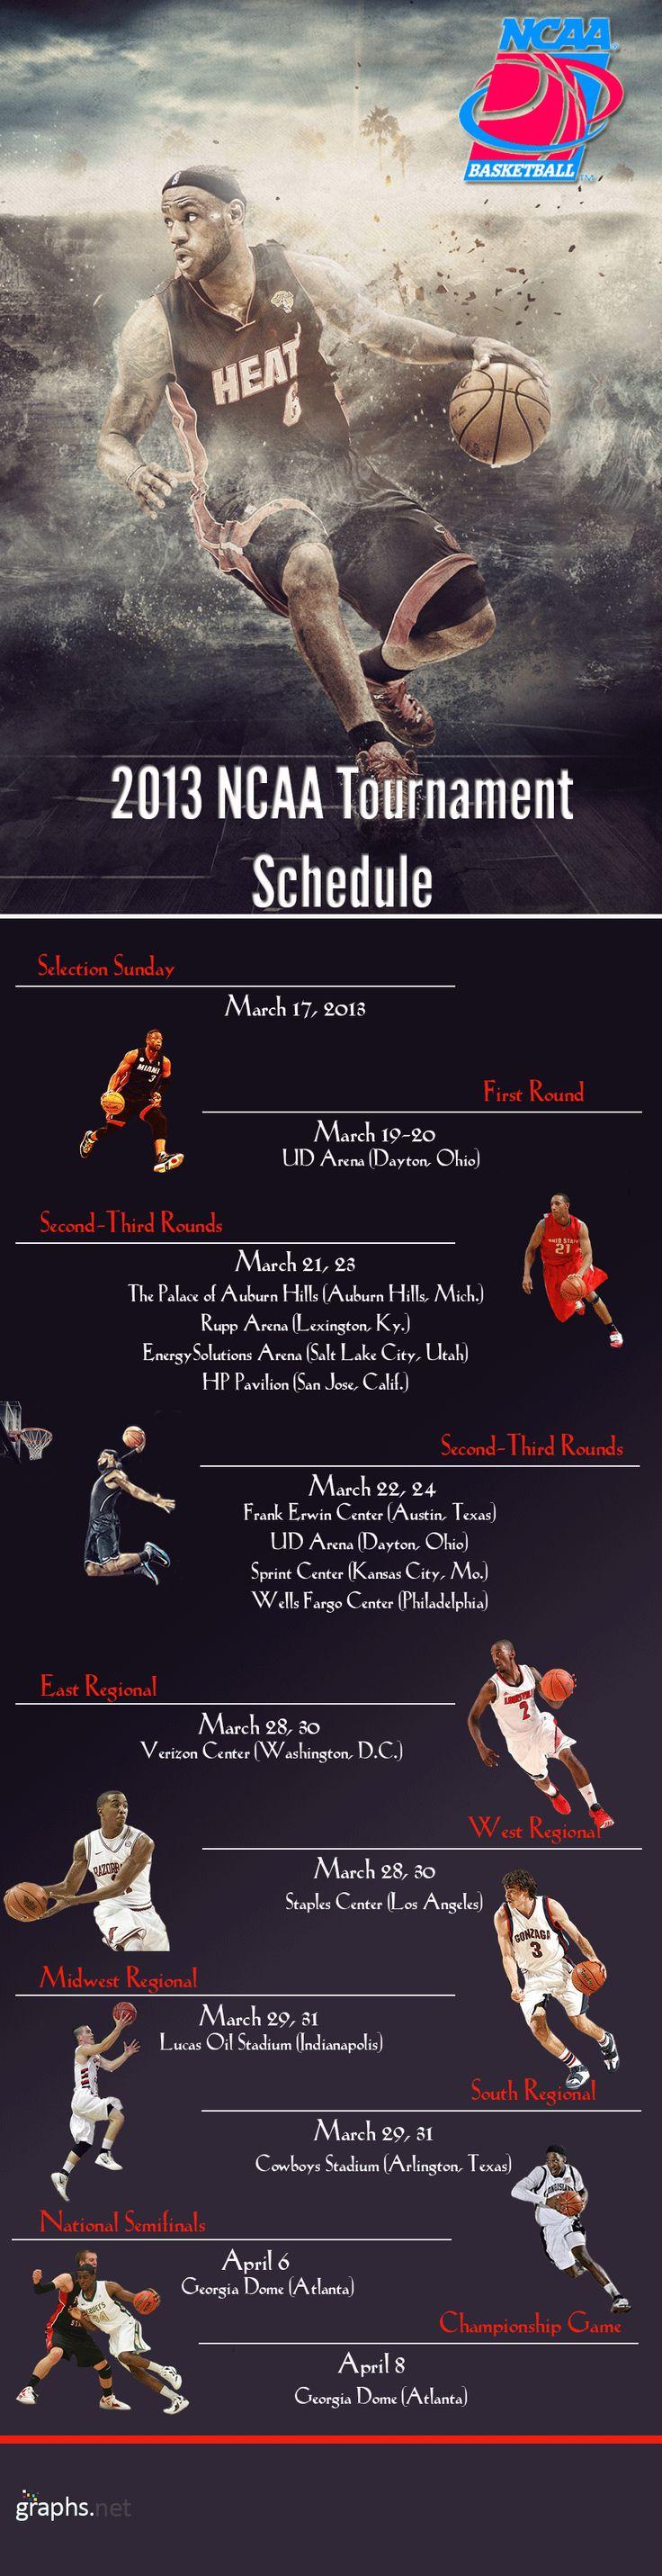 NCAA Basketball Tournament 2013 Schedule #NCAA #Basketball #Tournament #2013 #Schedule #sports #infographics